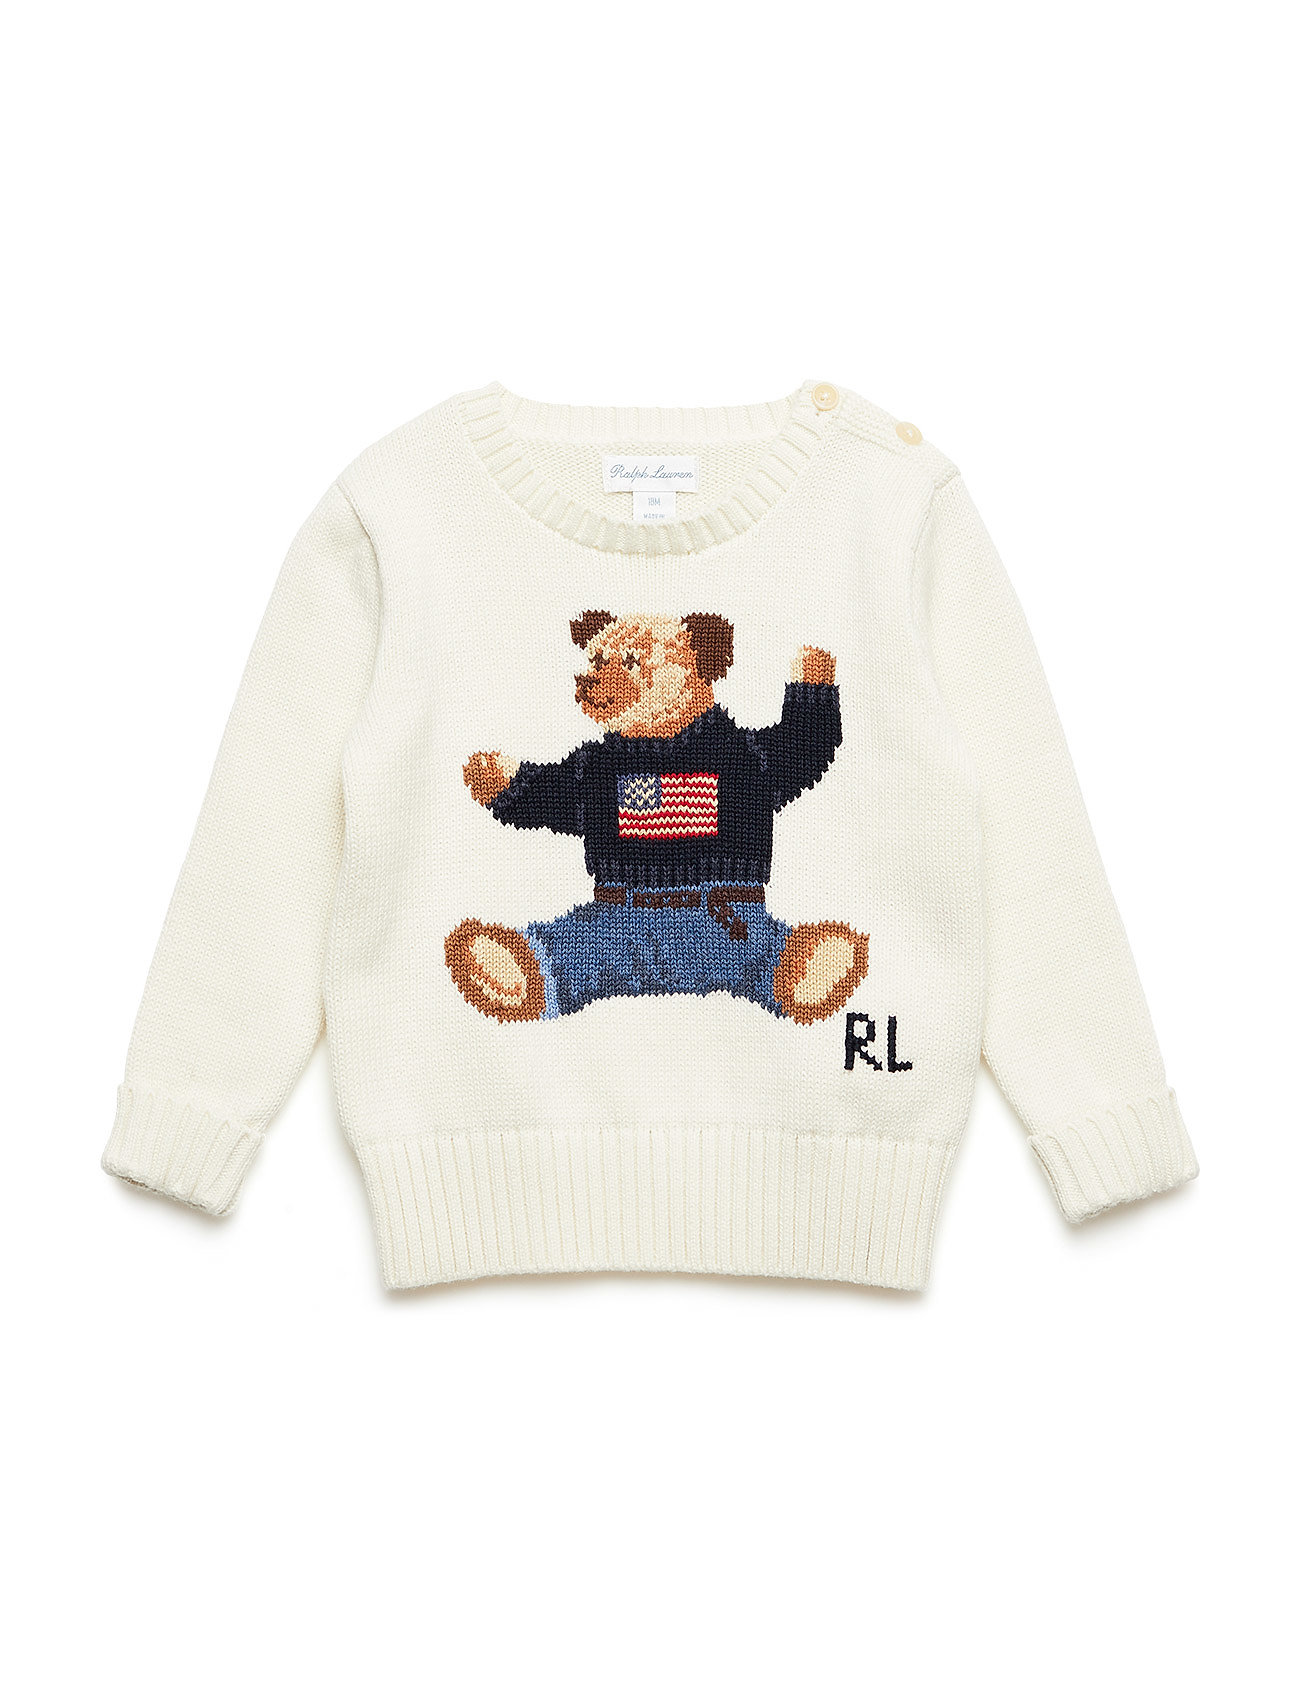 538405cac064 Polo Bear Cotton Sweater (Warm White) (£53.55) - Ralph Lauren Baby ...